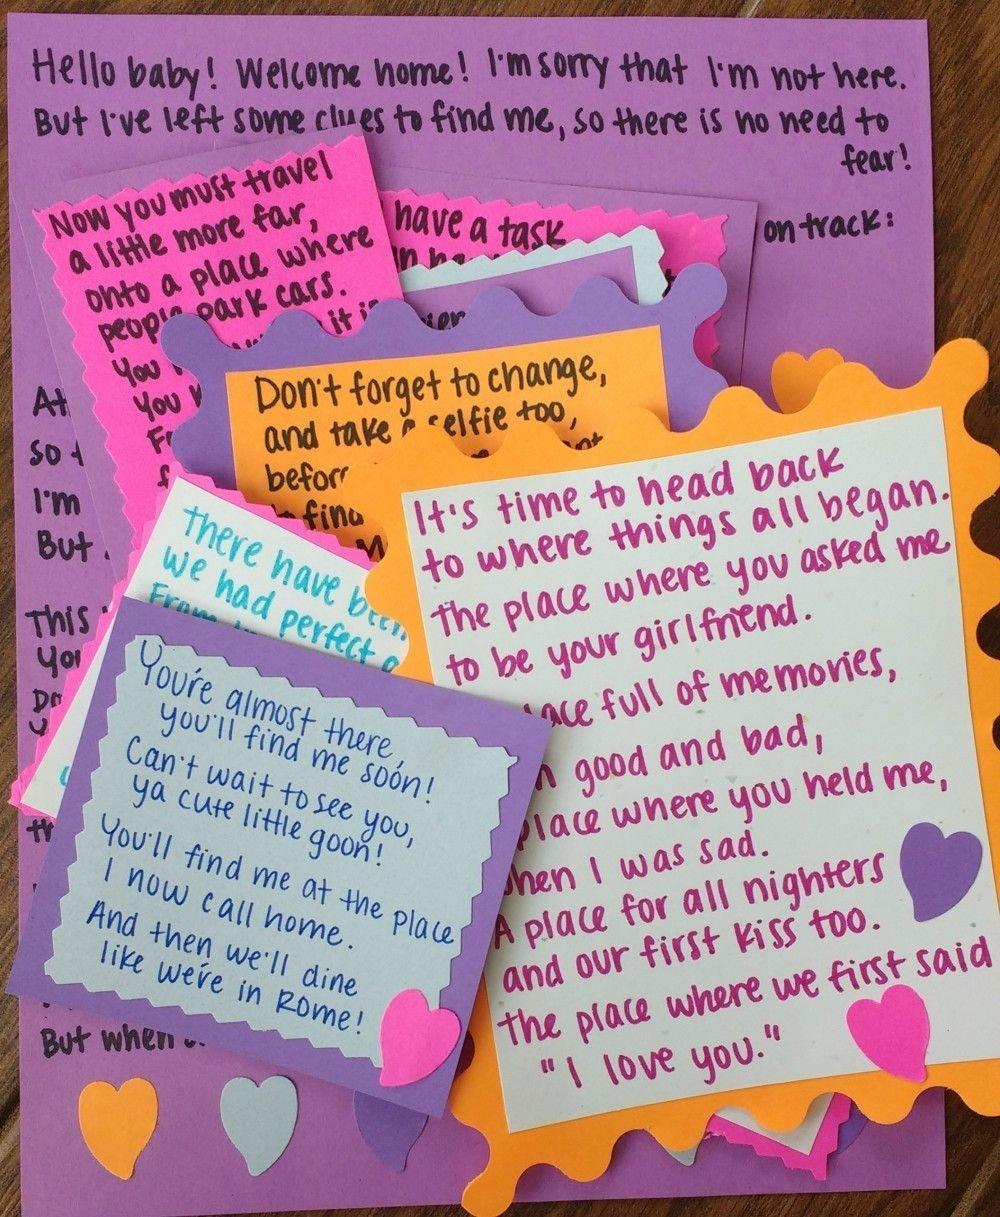 10 Attractive Scavenger Hunt Ideas For Boyfriend diy personalized anniversary gift ideas boyfriends anniversaries 2021